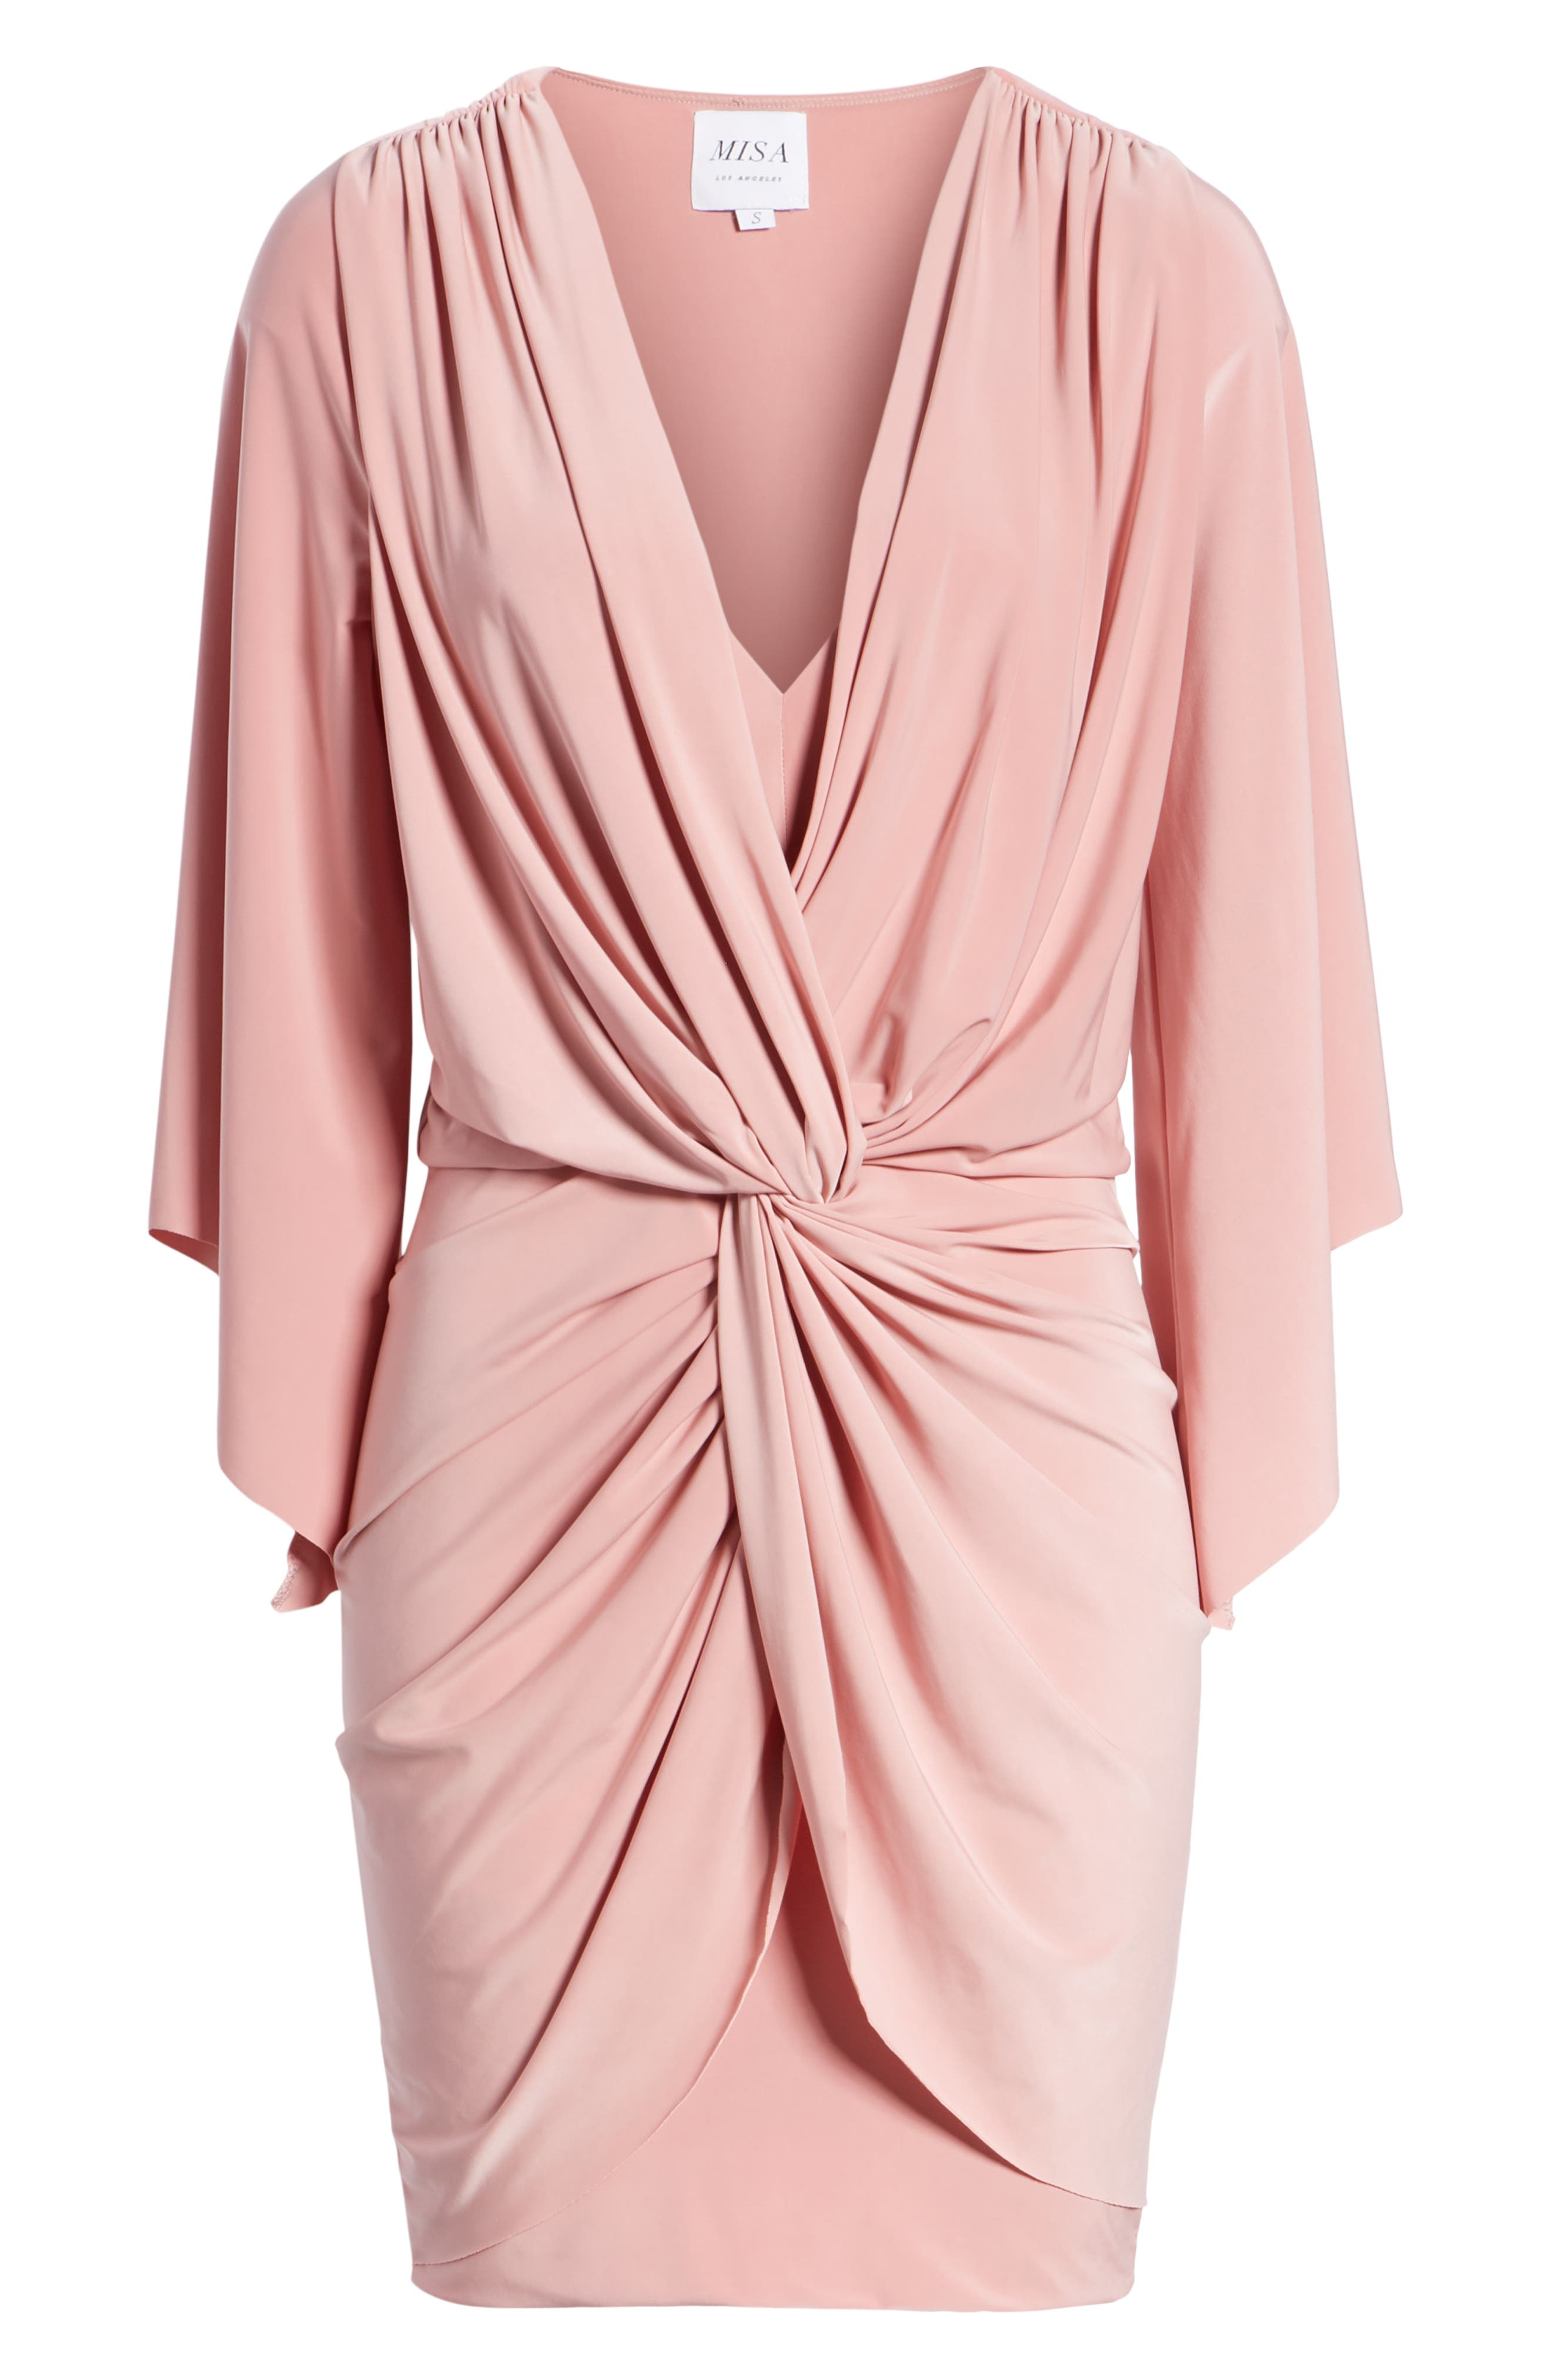 Teget Knot Front Dress,                             Alternate thumbnail 7, color,                             DUSTY ROSE